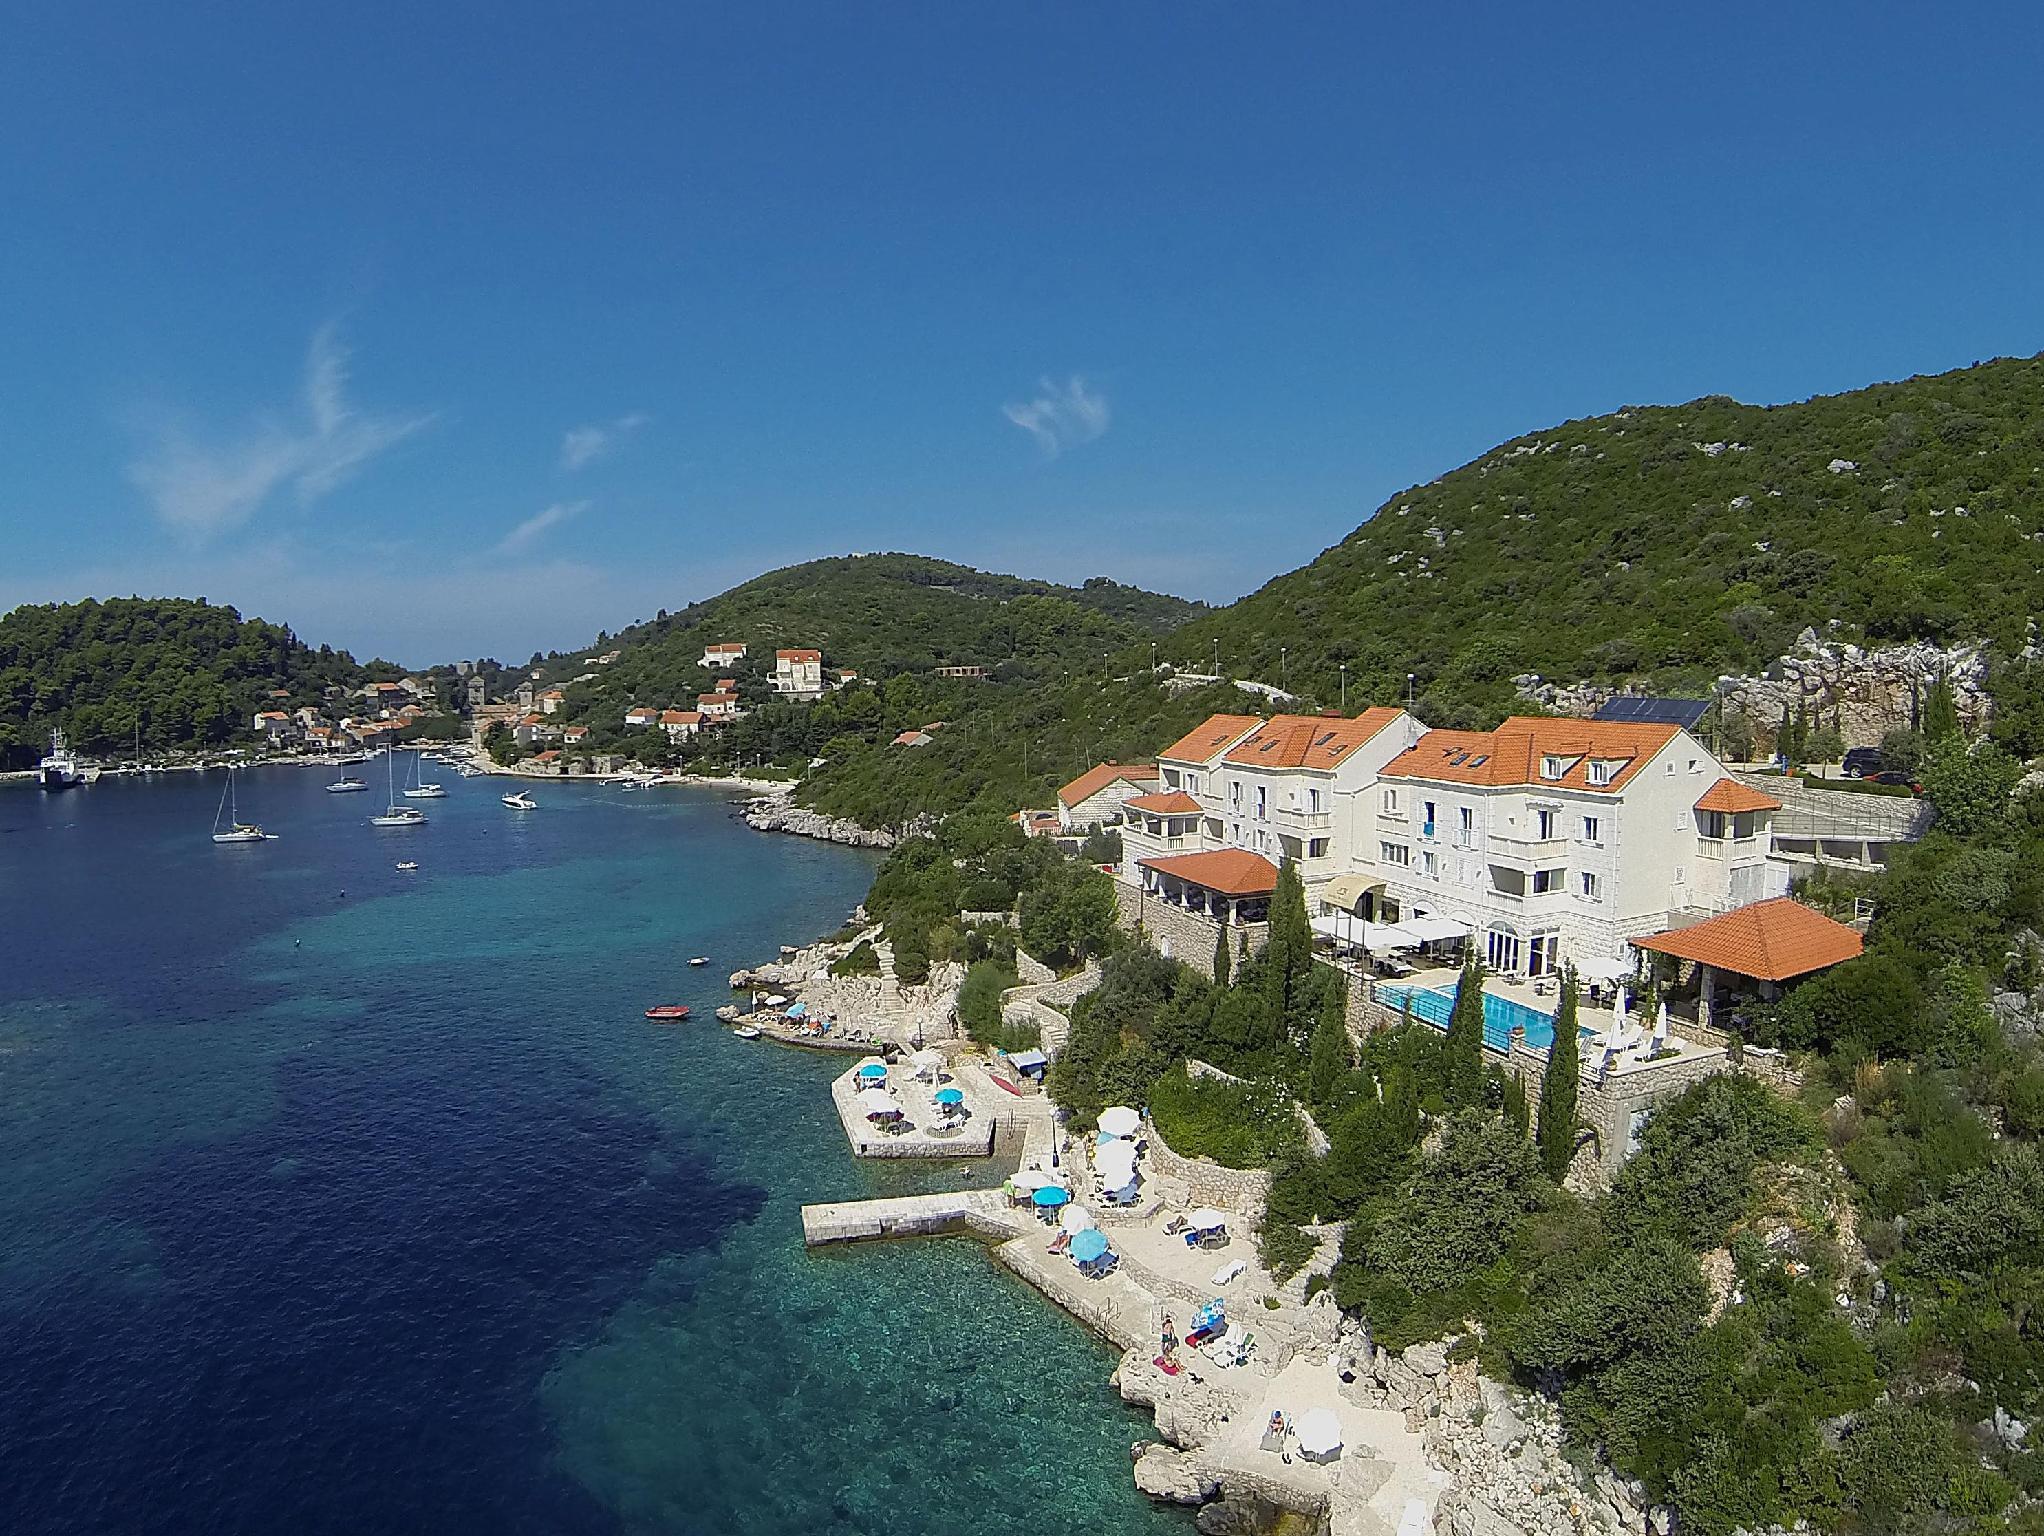 Hotel Bozica Dubrovnik Islands Dubrovnik - View